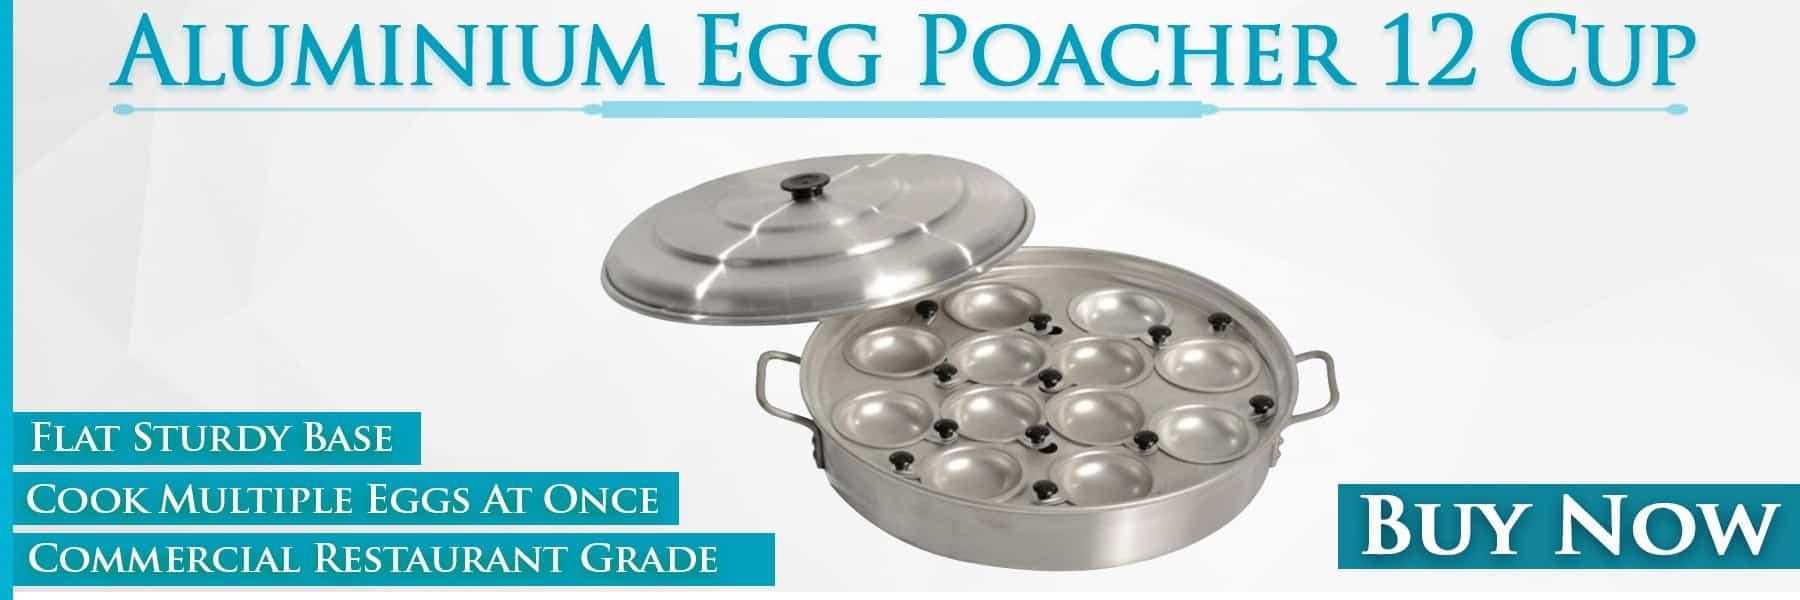 KH Aluminium Egg Poacher 12 Cup